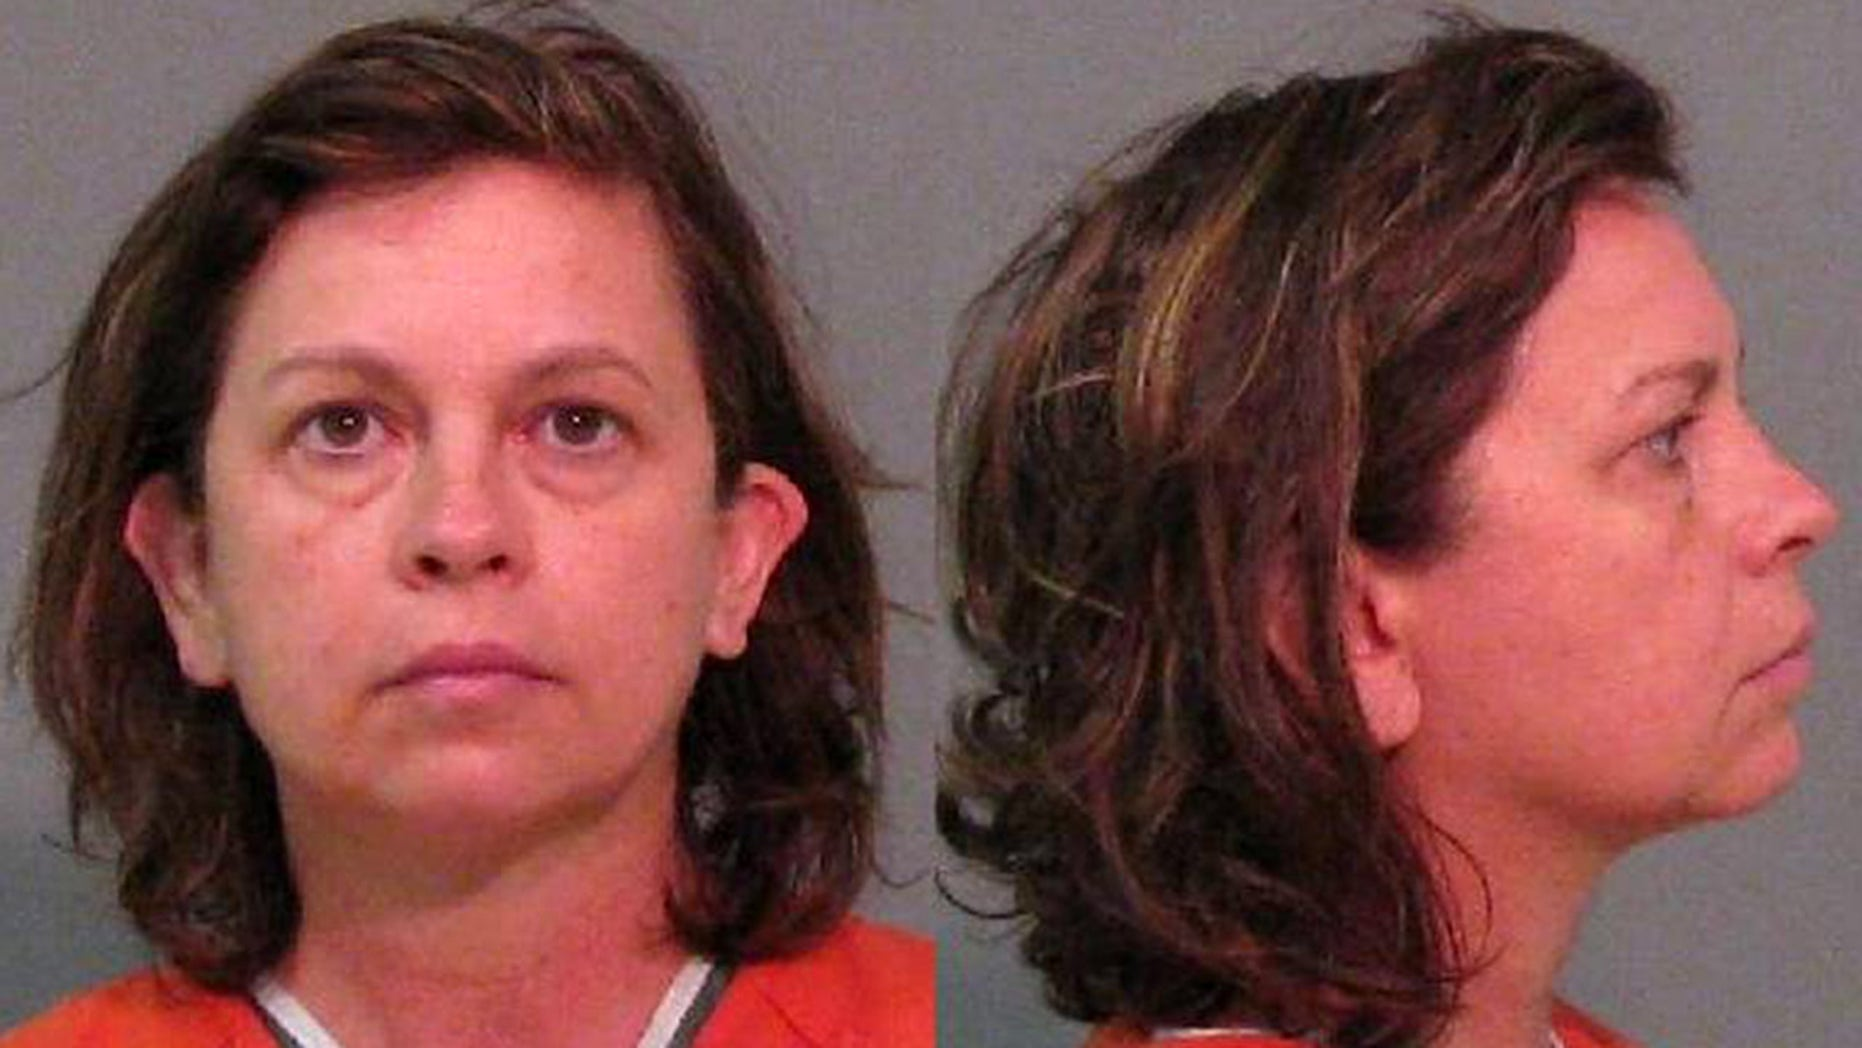 Mug shot for Lana Sue Clayton, 52, charged with killing husband with eye drops.